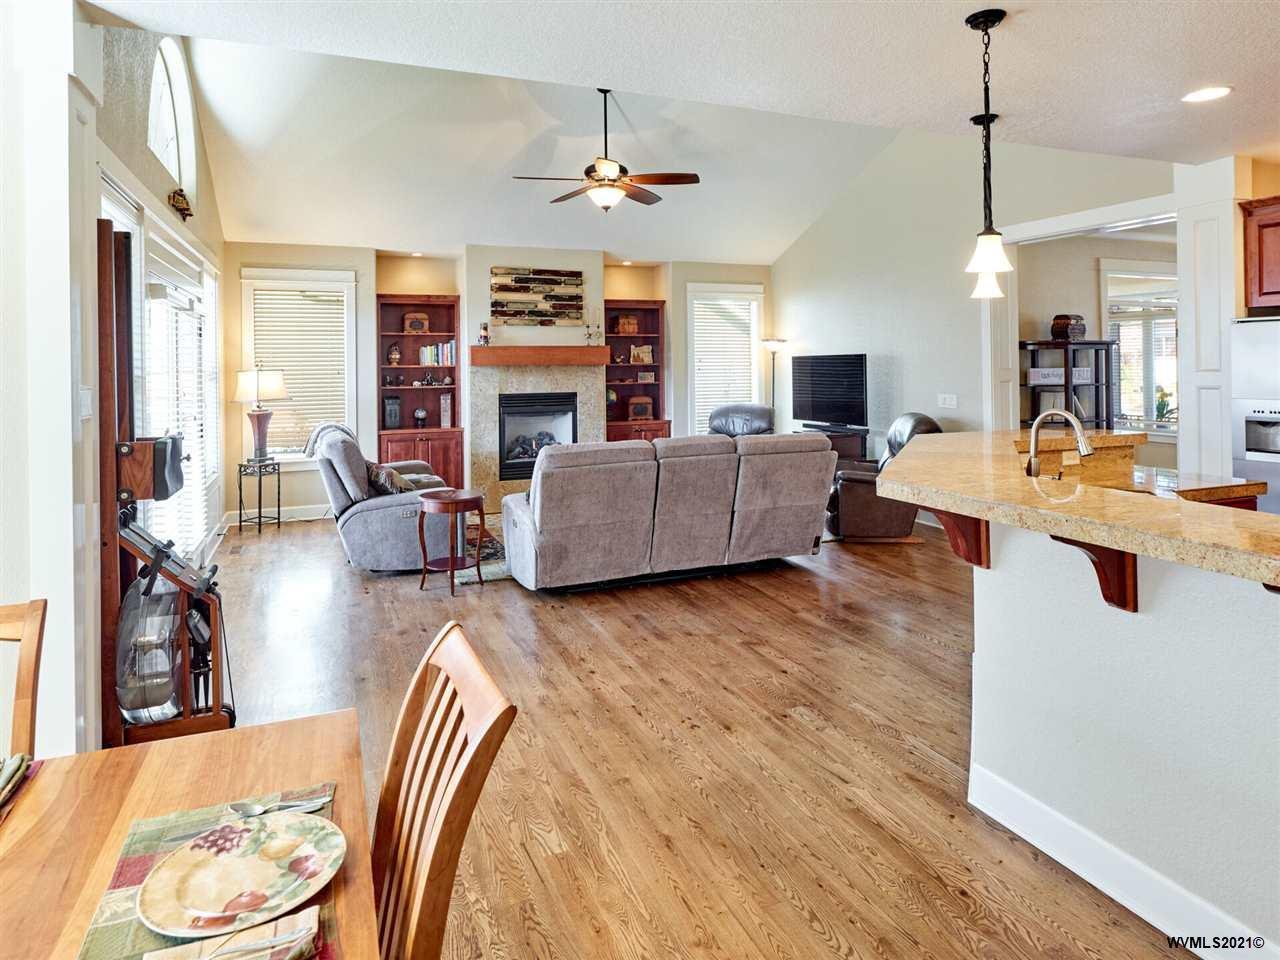 525 Yapa Dr, Silverton, Oregon 97381-1787, 3 Bedrooms Bedrooms, ,2 BathroomsBathrooms,Single Family,For Sale,525 Yapa Dr,1,774885